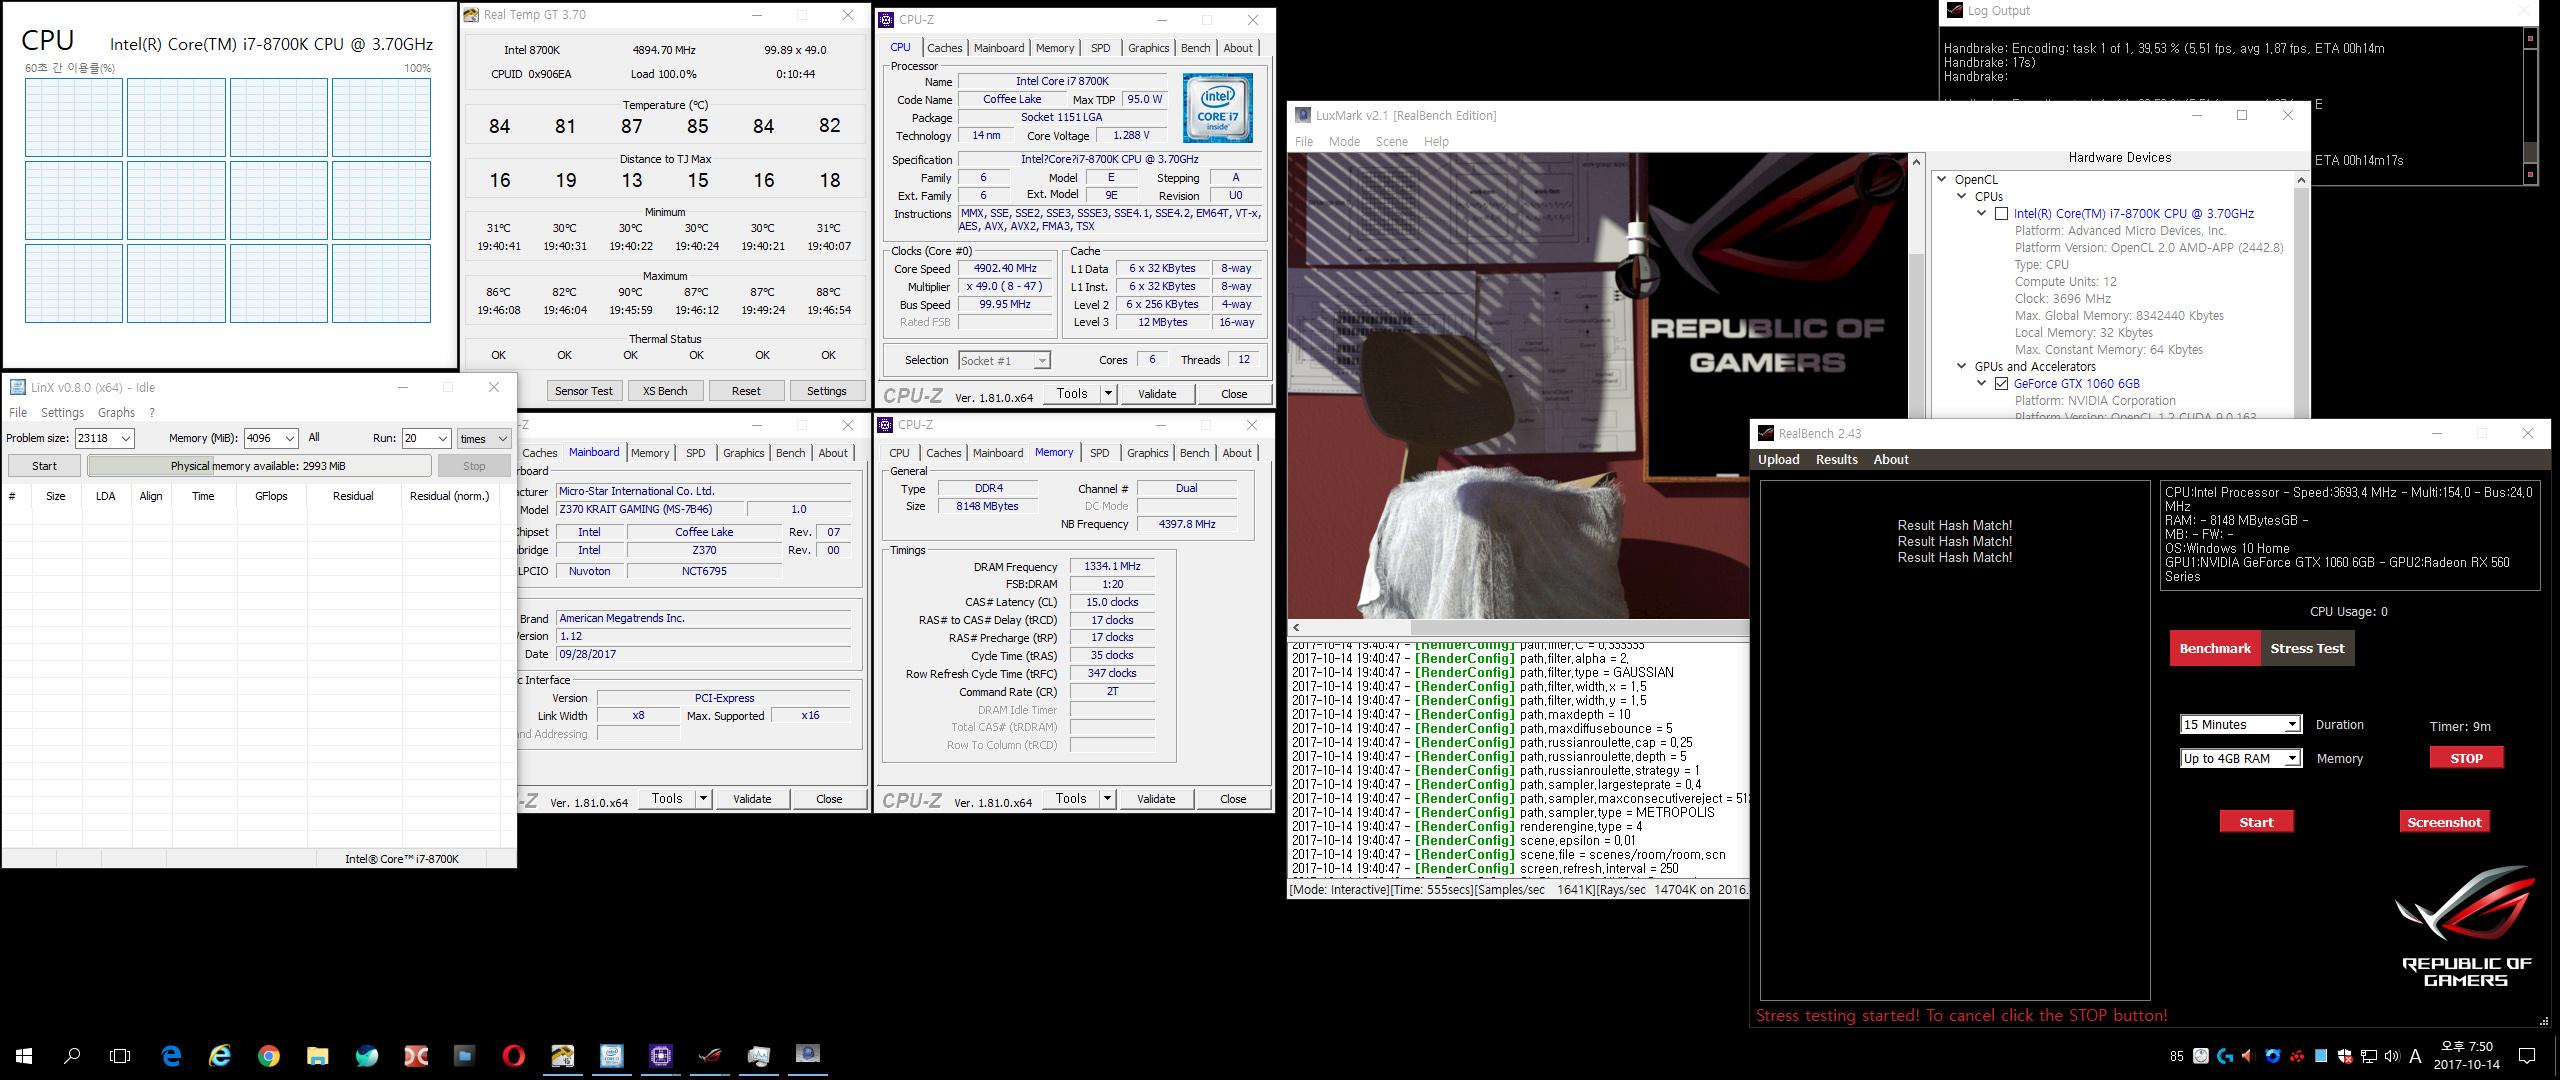 MSI Z370 오버클럭킹 가이드 (feat 8700K) : 다나와 DPG는 내맘